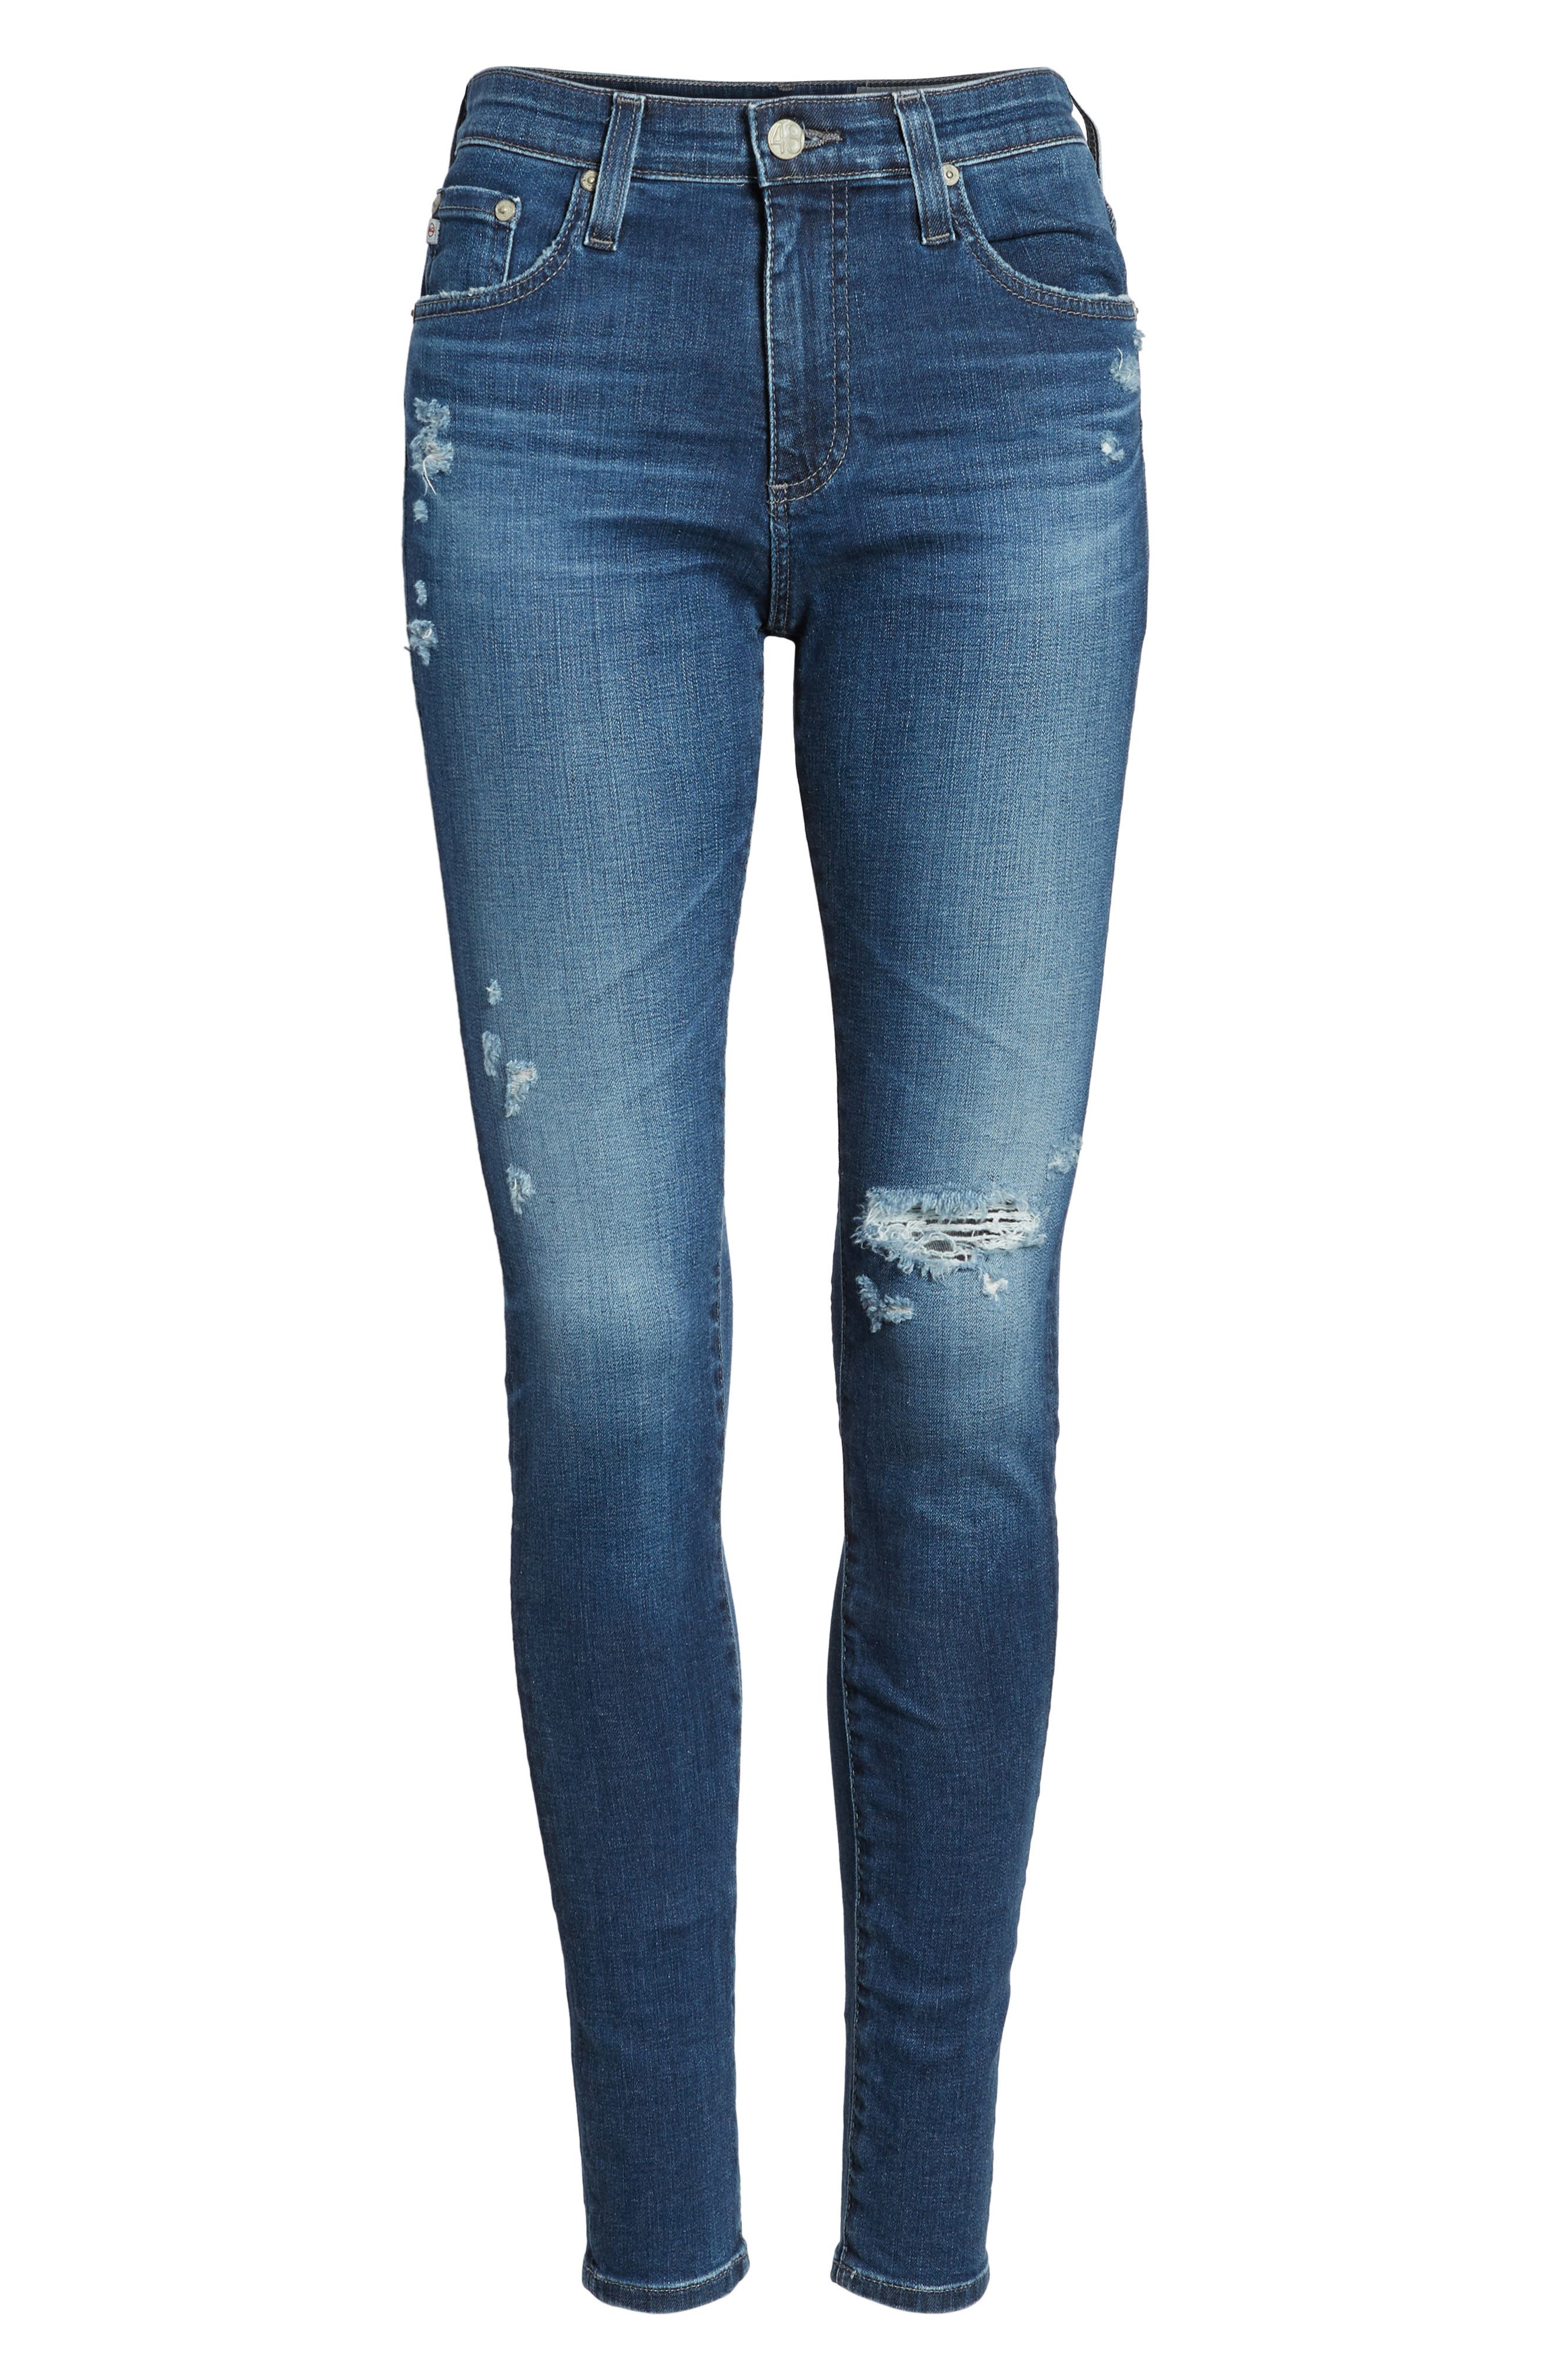 'The Farrah' High Rise Skinny Jeans,                             Alternate thumbnail 50, color,